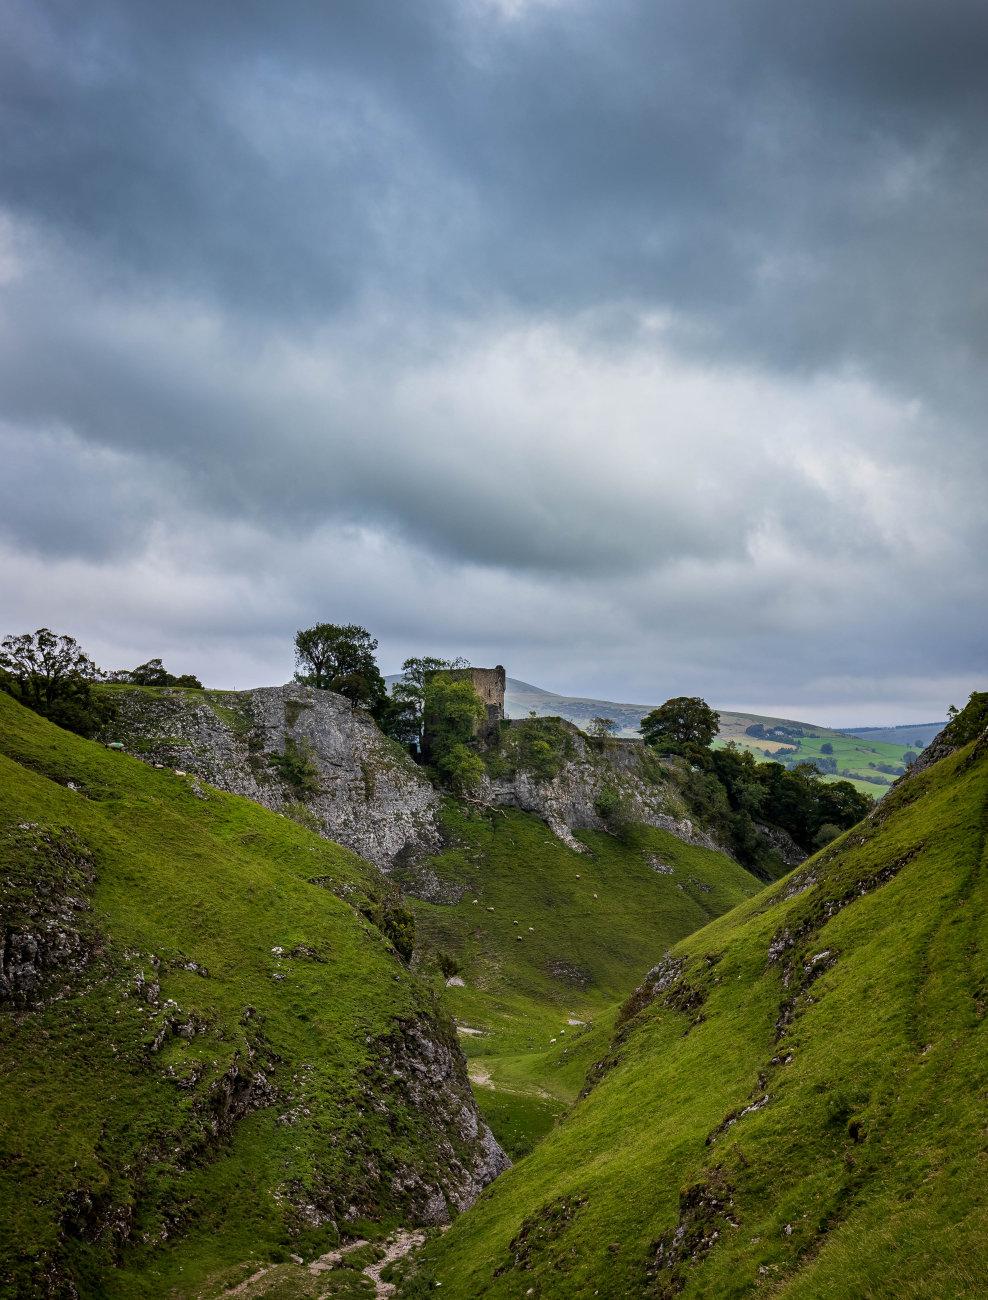 Peveril Castle. Castleton, Derbyshire.